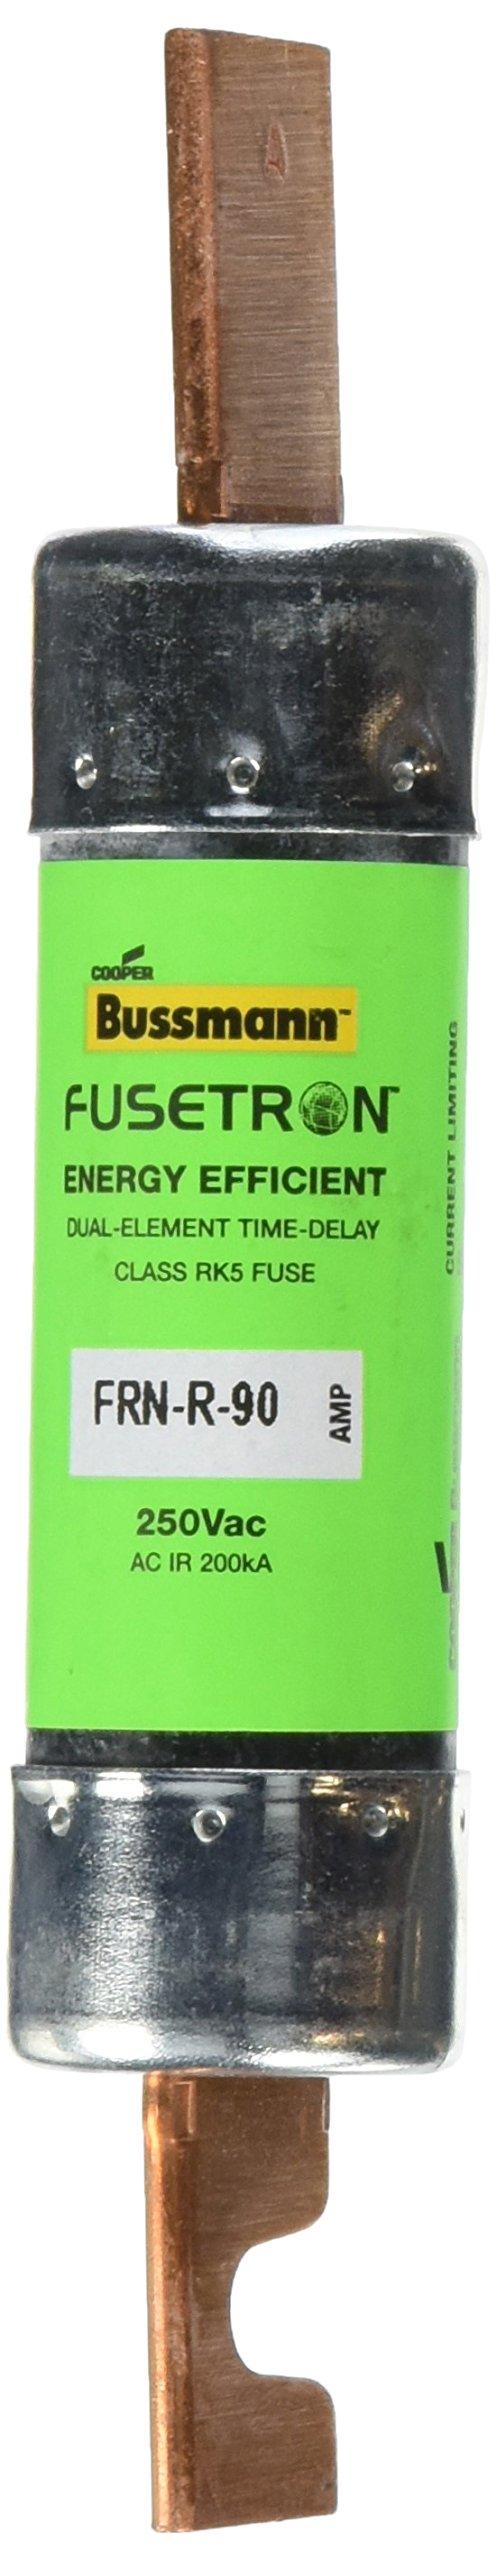 Cooper Bussmann FRN-R-90 FuseTRON Class RK5 Dual-Element Fuse by Cooper Bussmann